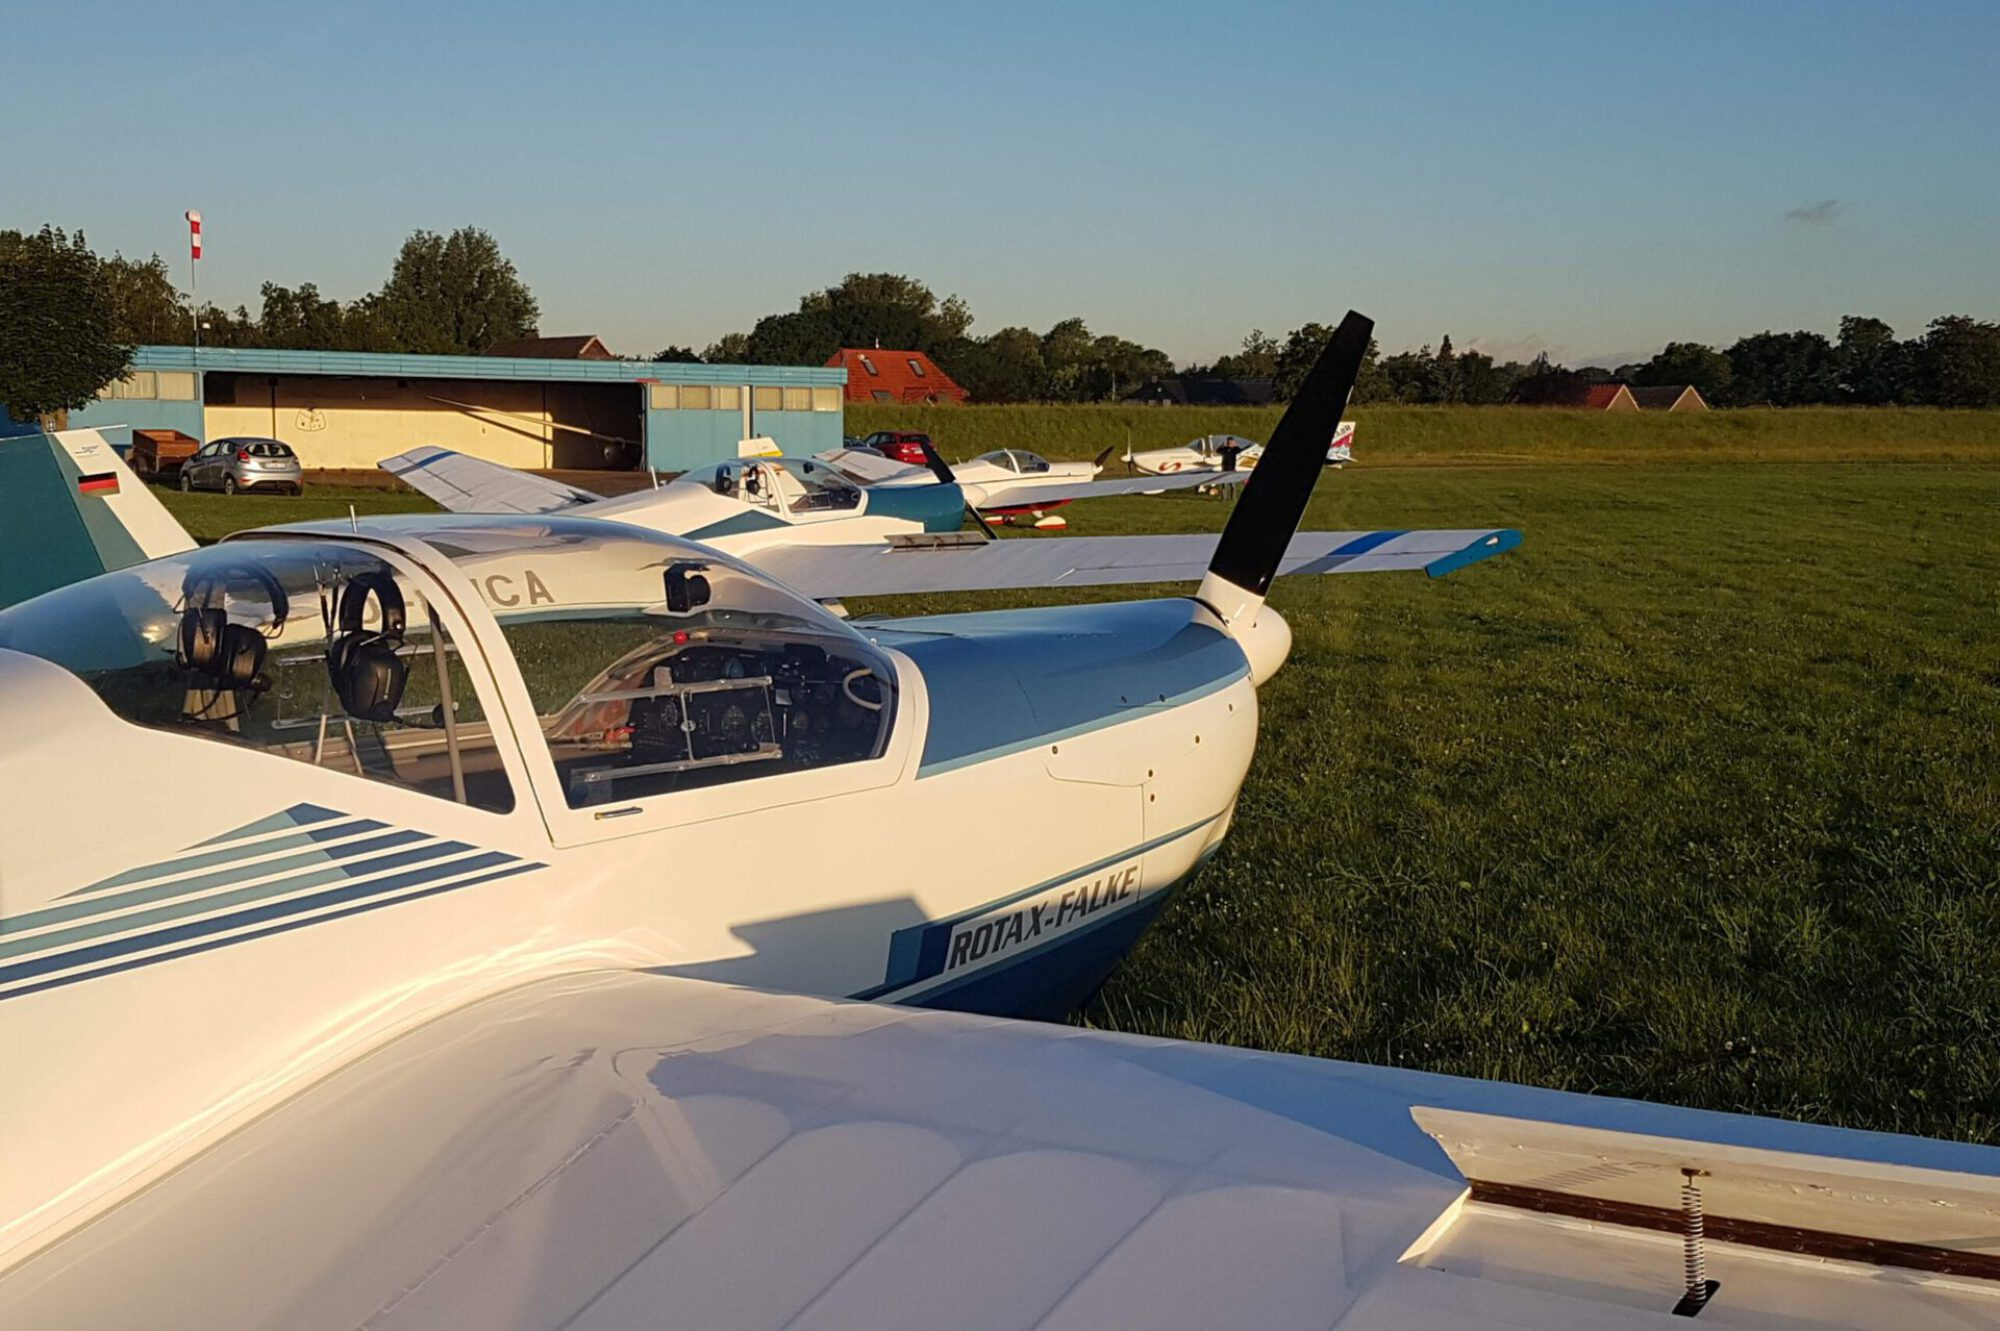 Motorsegler und Segelflug Club Bremerhaven e.V.